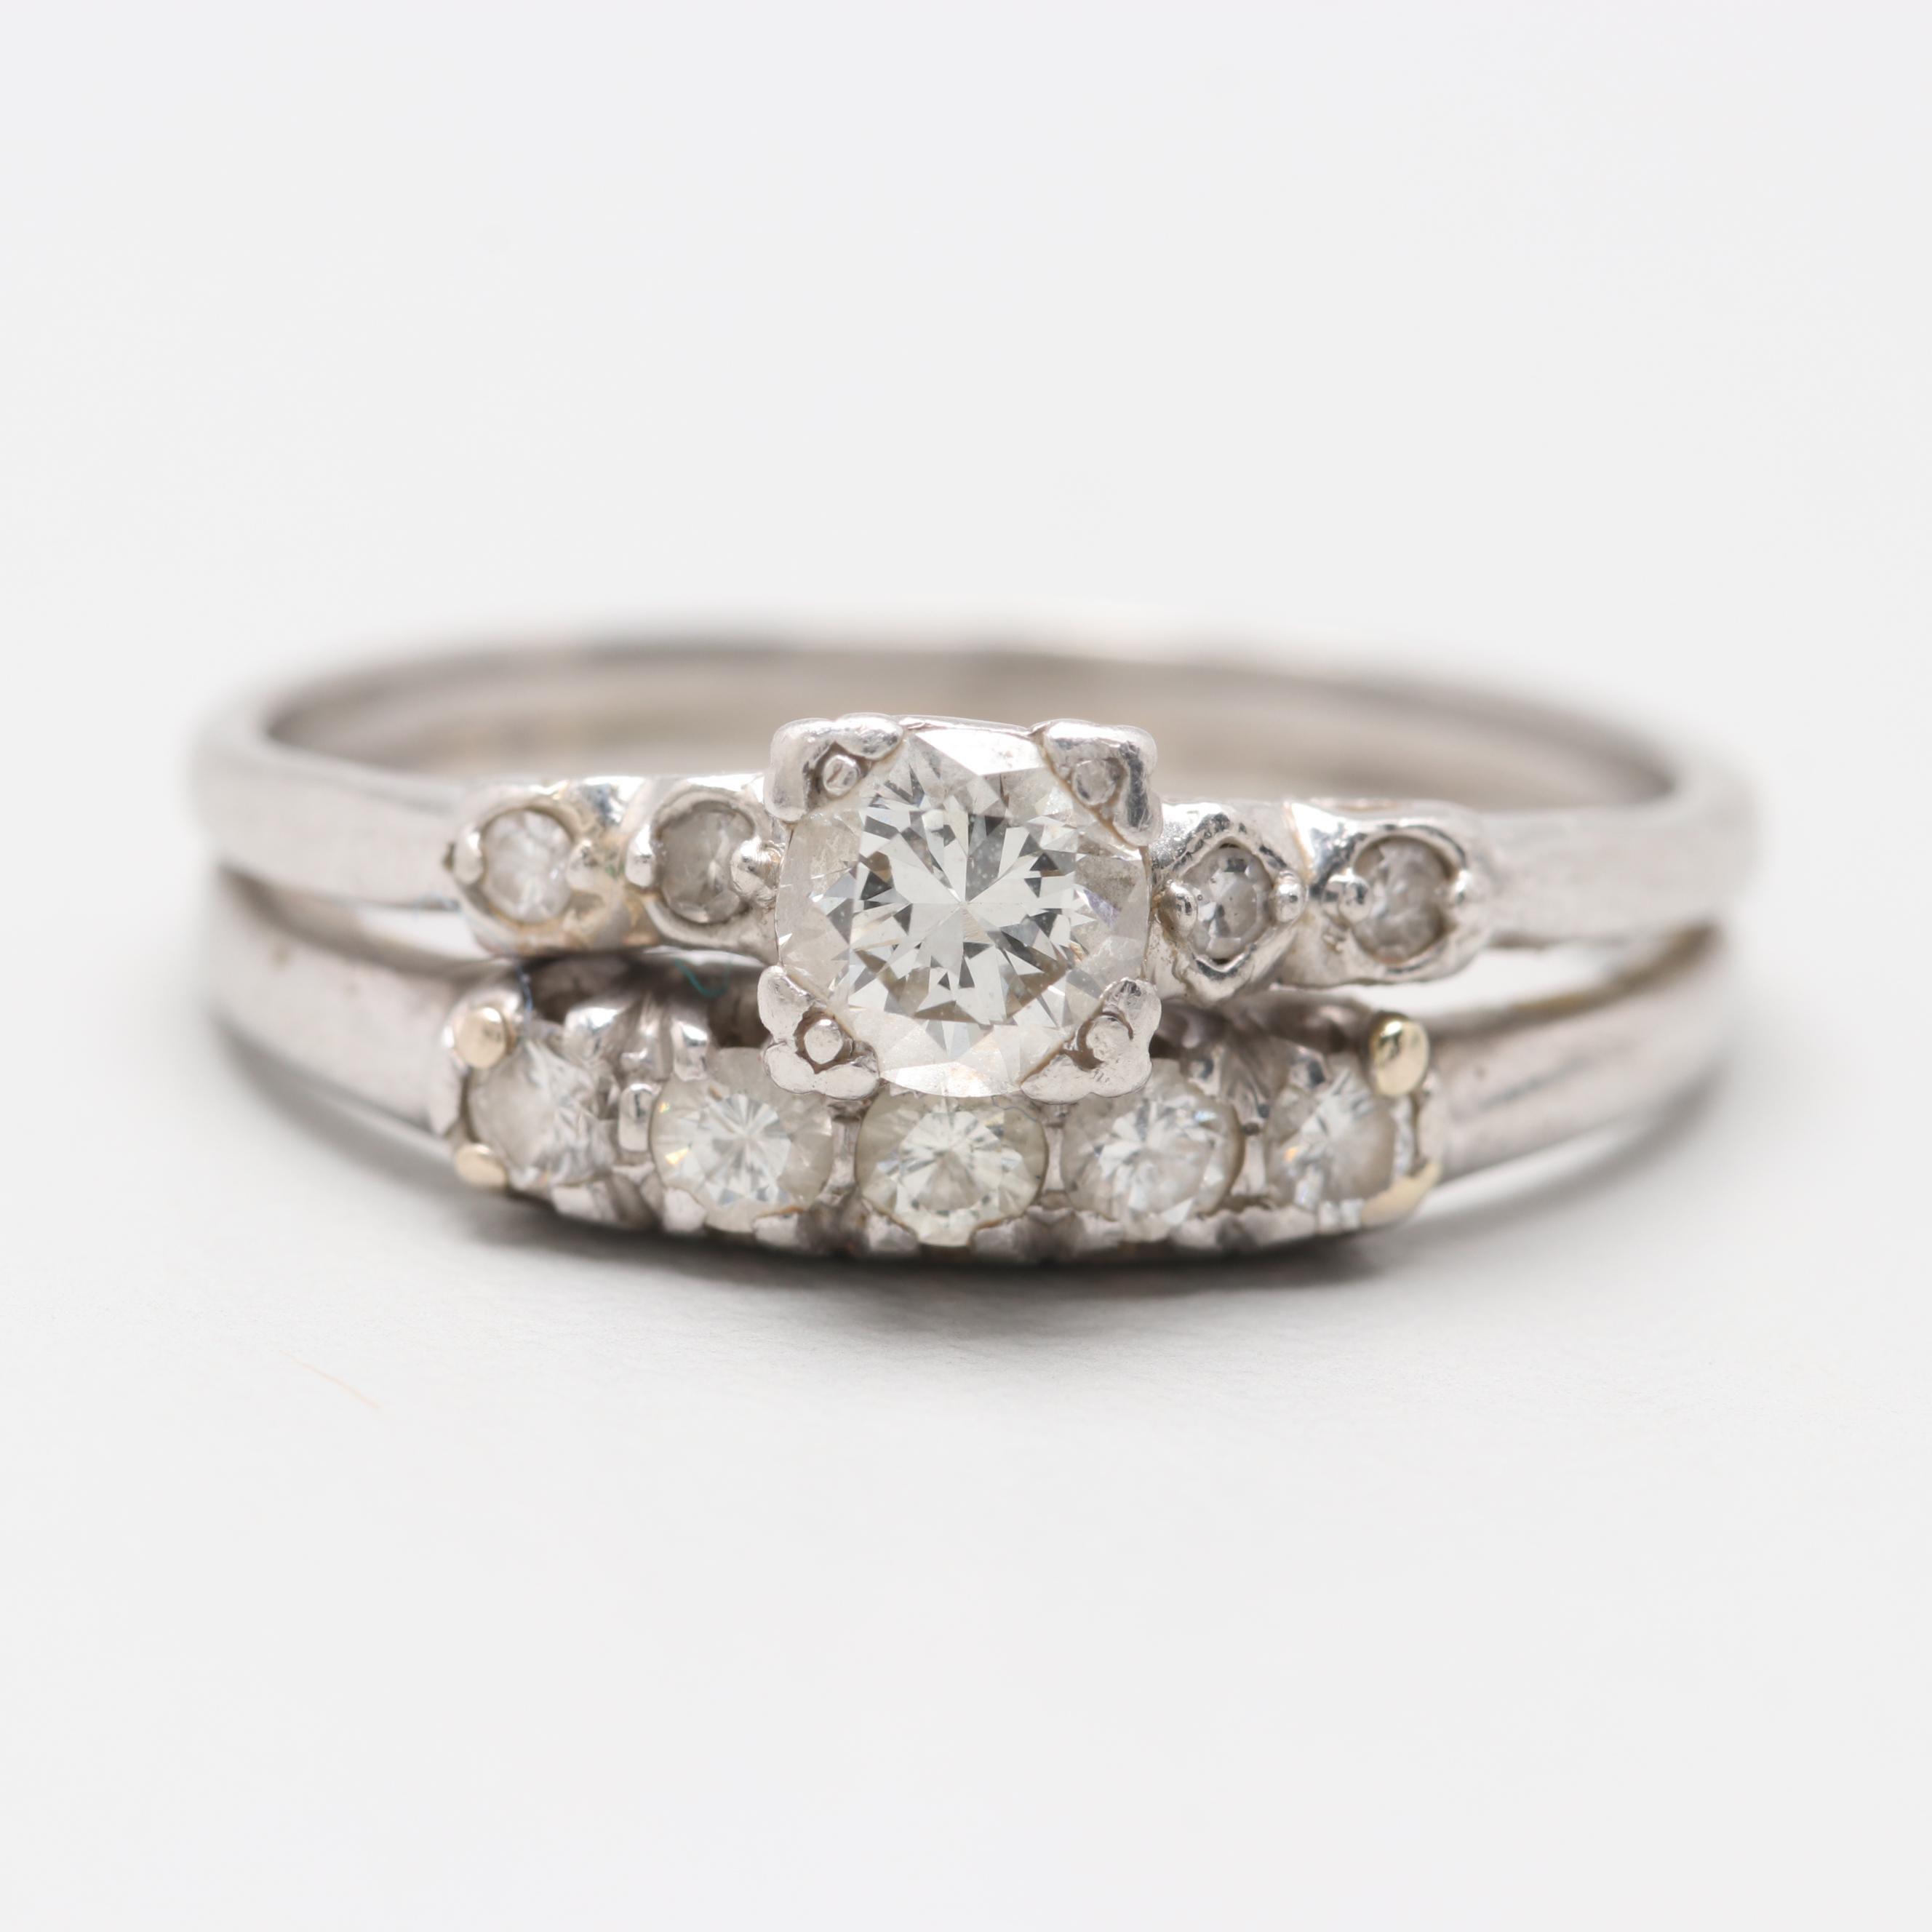 Platinum Soldered Diamond Ring Set